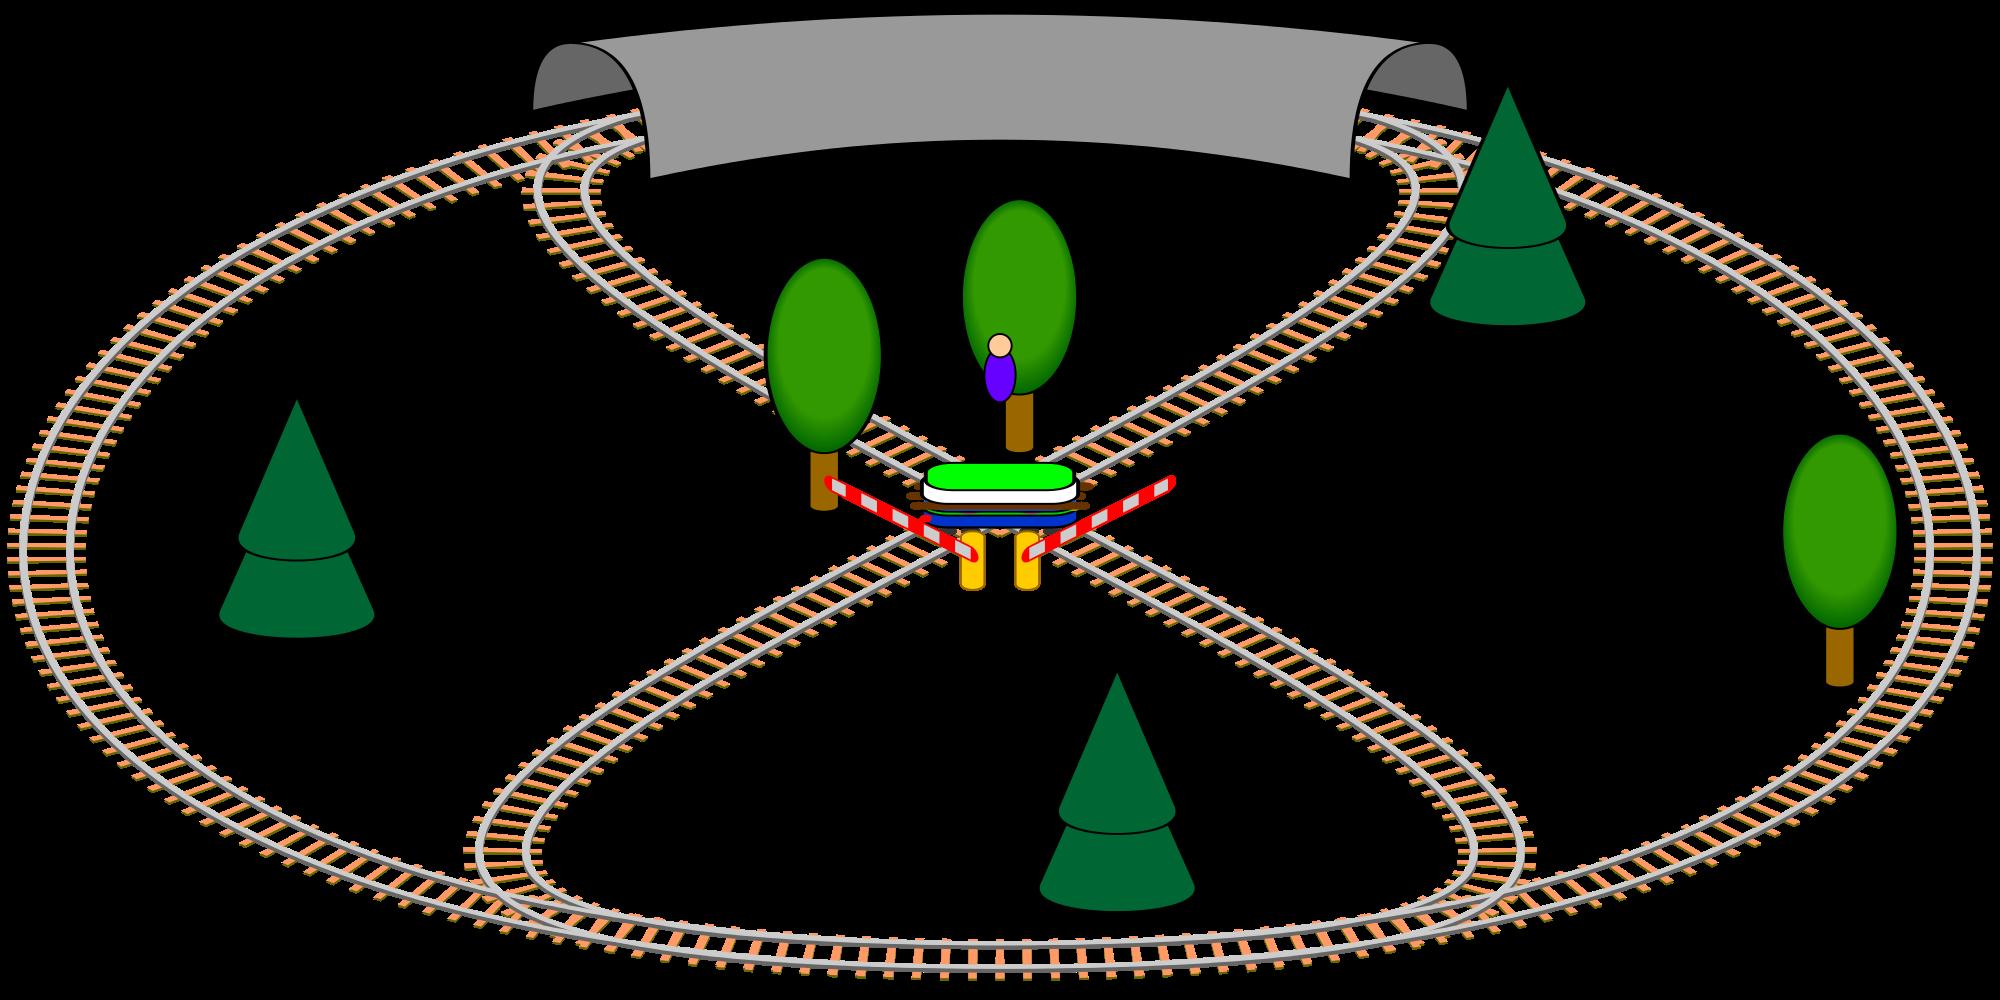 Track clipart toy train. File smil svg wikimedia